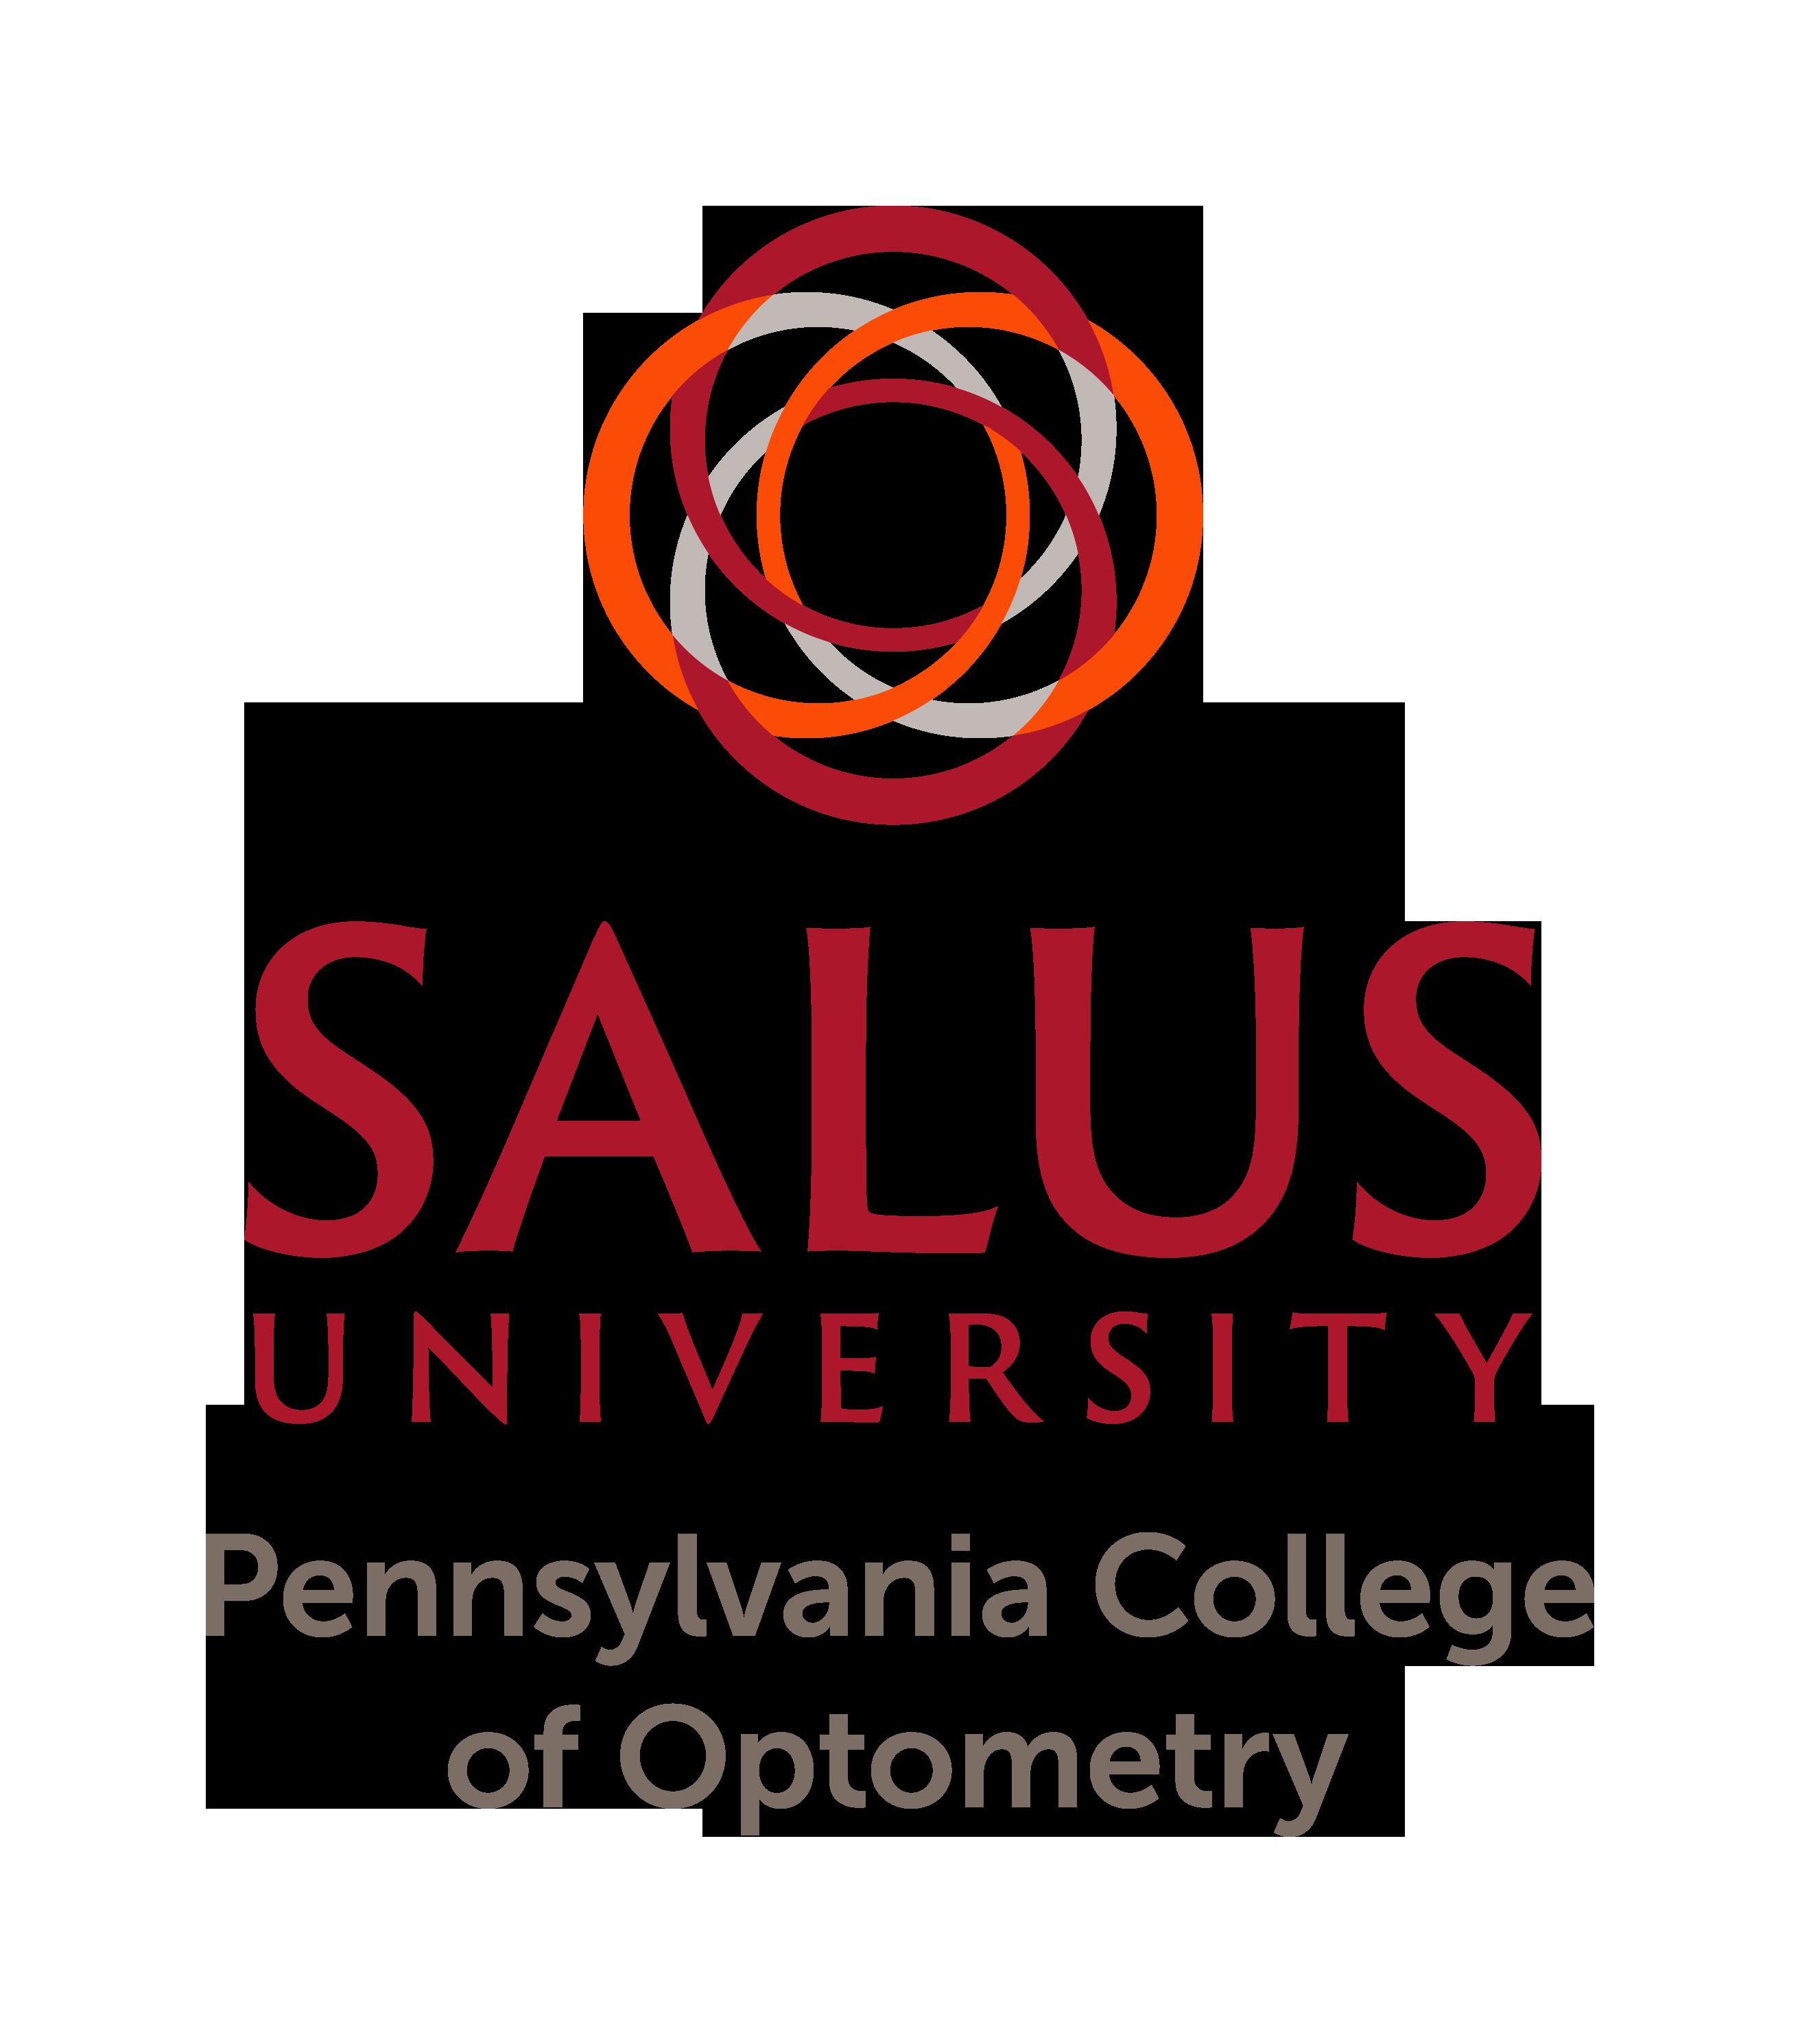 SalusUniv-Logo_Vertical_PennsylvaniaCollegeofOptom